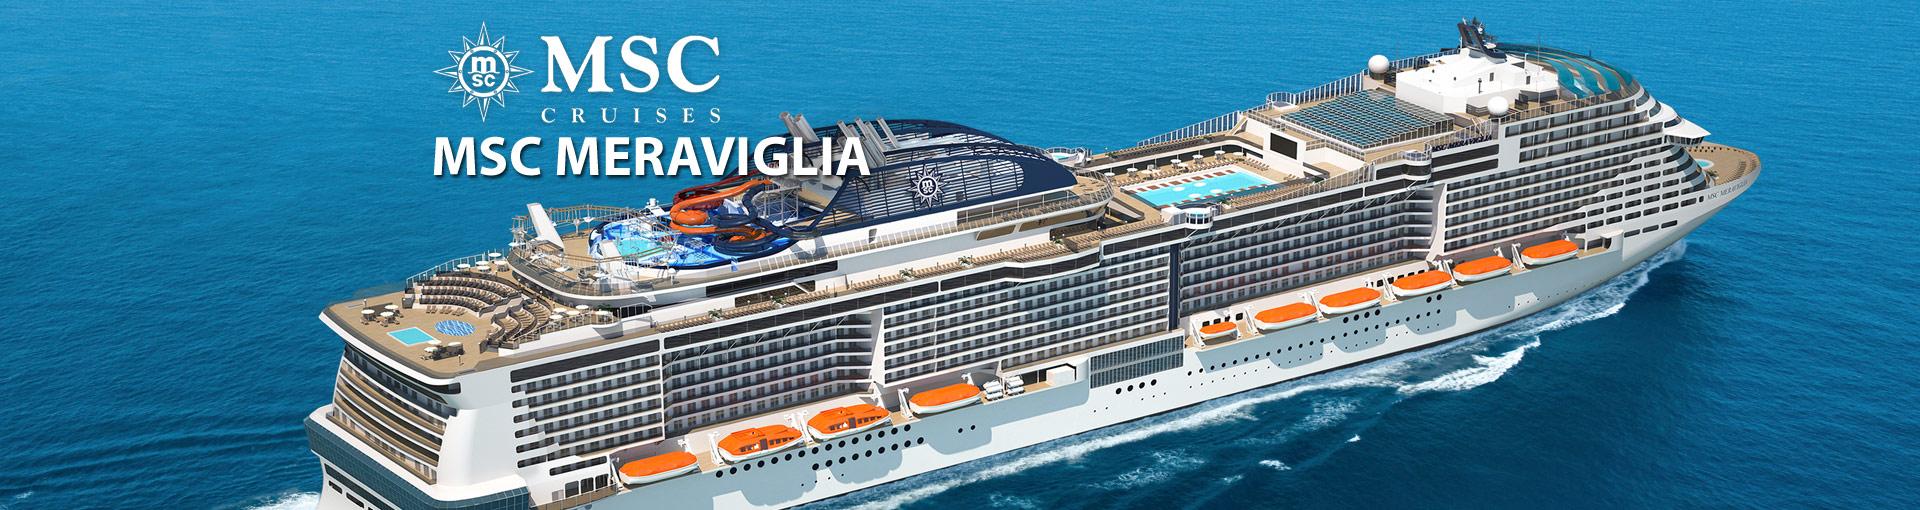 MSC Cruises MSC Meraviglia cruise ship